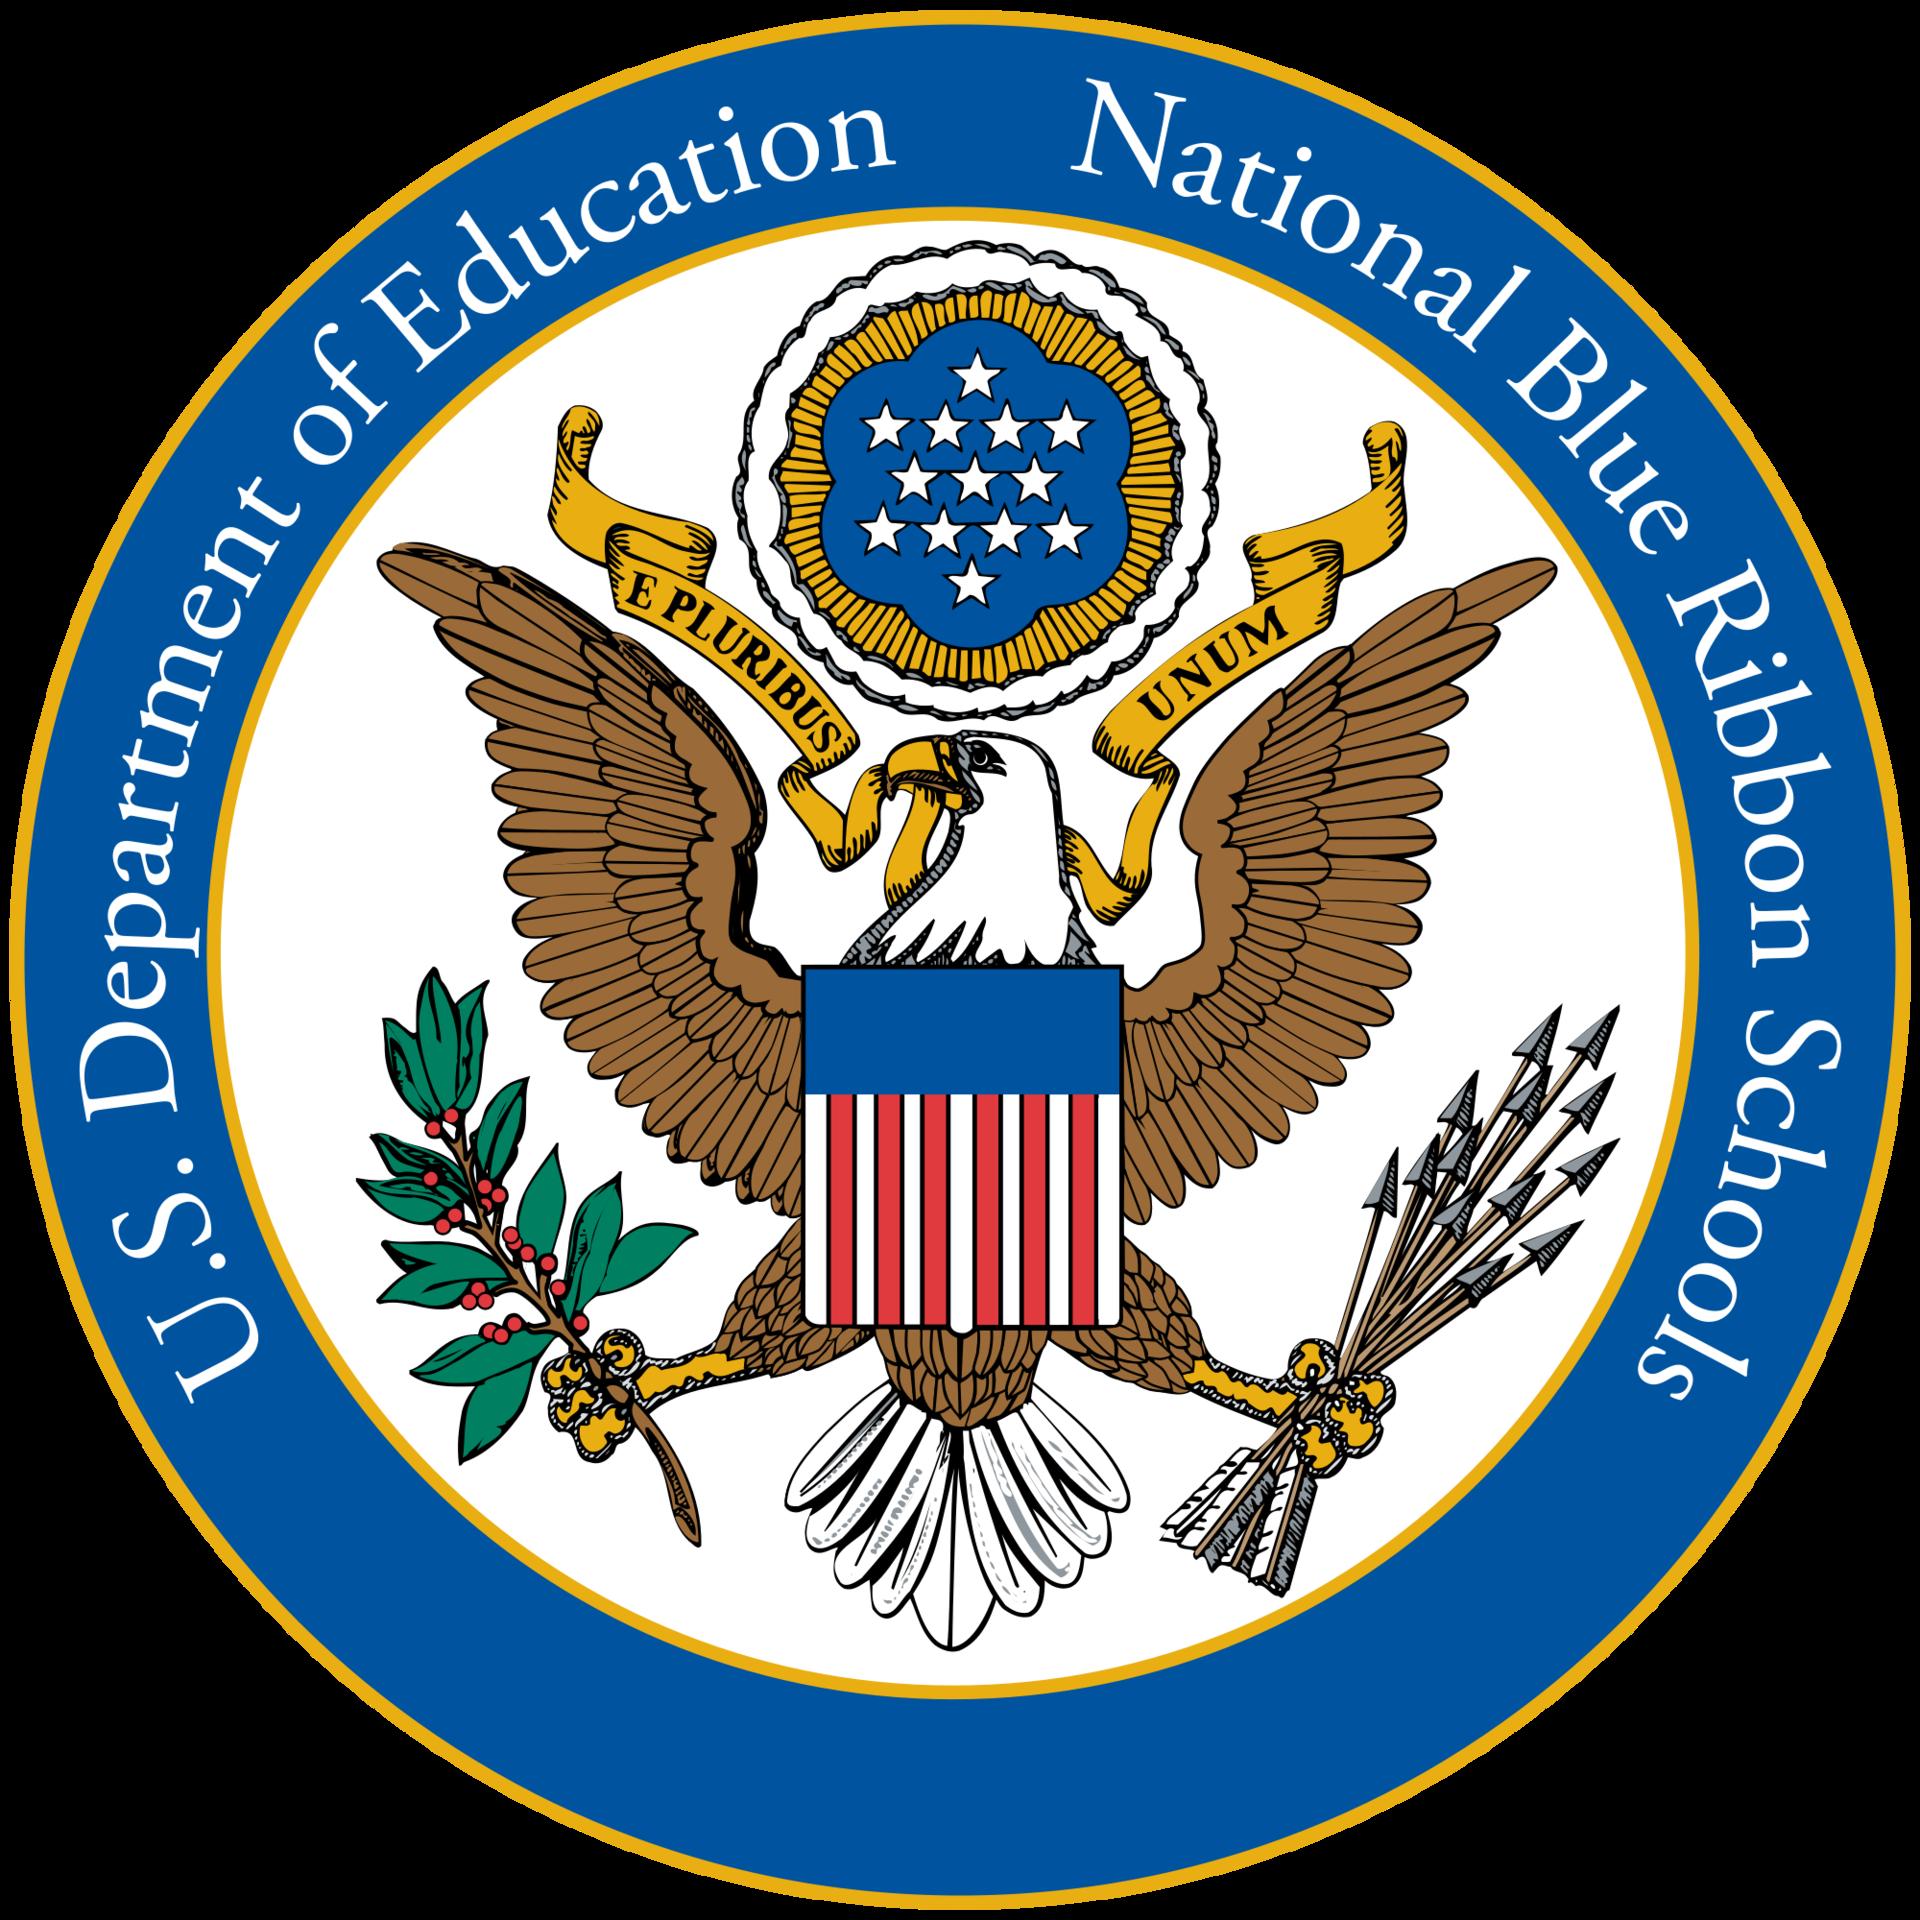 Logo for National Blue Rib